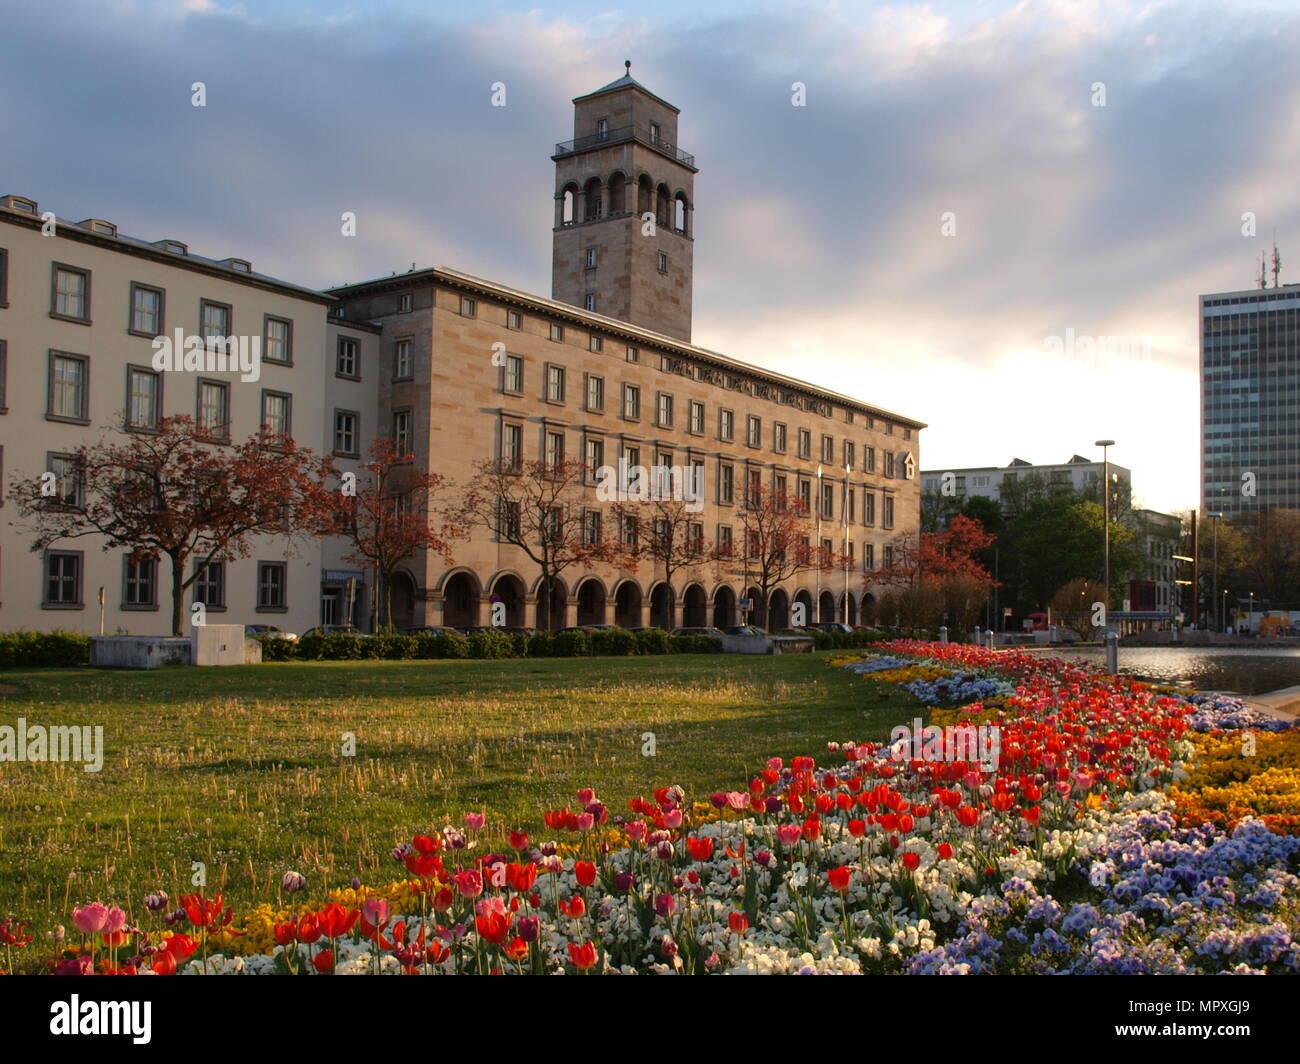 'Die Stadtmitte' cultural center in Karlsruhe, Germany - Stock Image